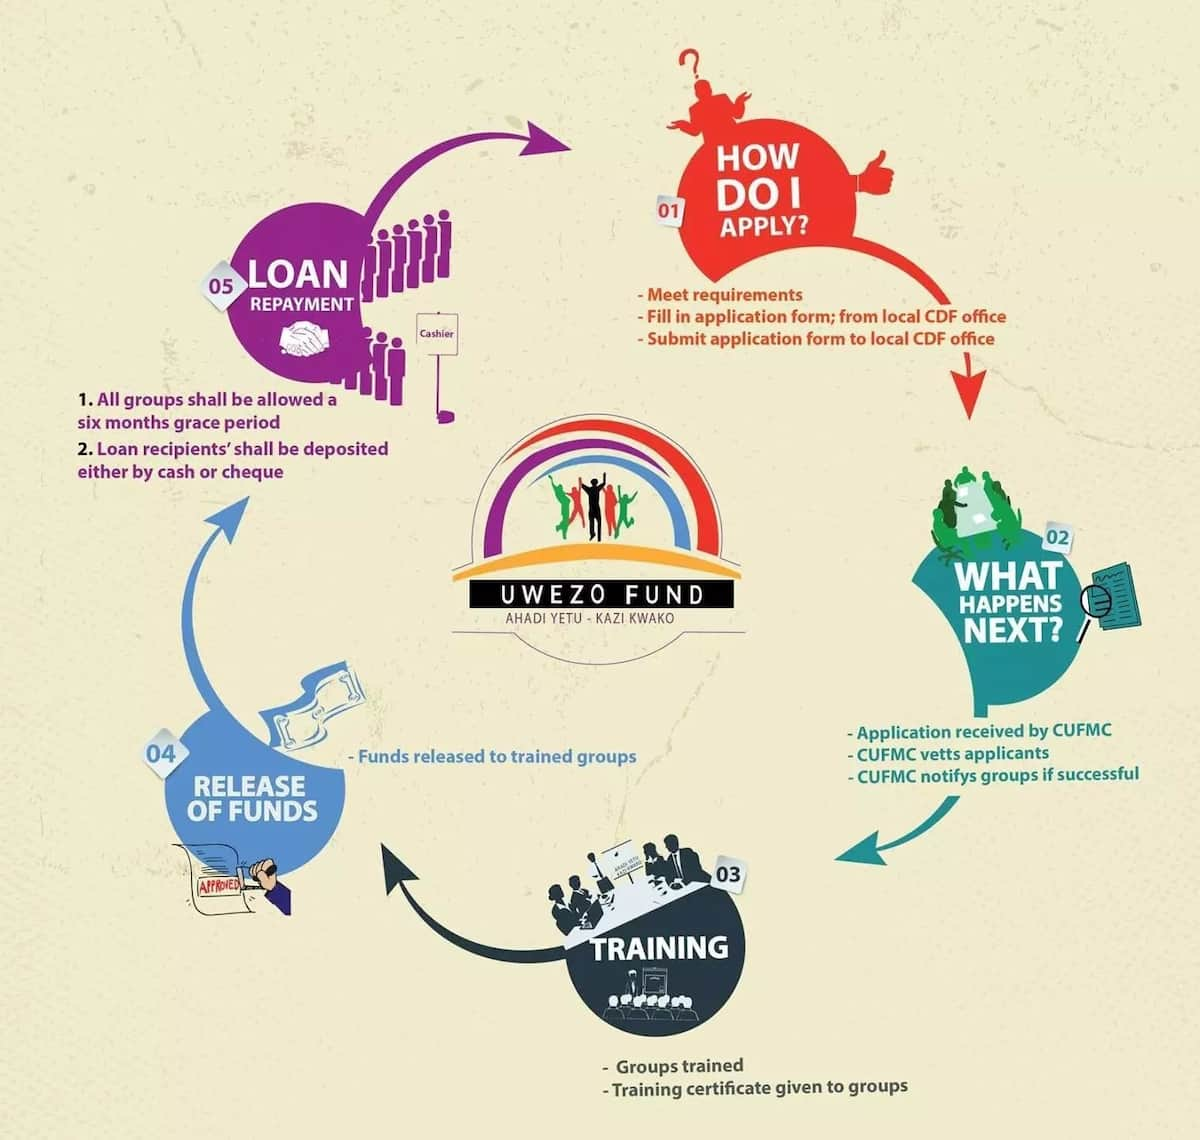 youthfund kenya kenya youth empowerment fund uwezo fund application form youth fund individual loan youth fund application form uwezo fund kenya uwezo fund requirements uwezo funds kenya youth fund youth development fund uwezo kenya uwezo fund